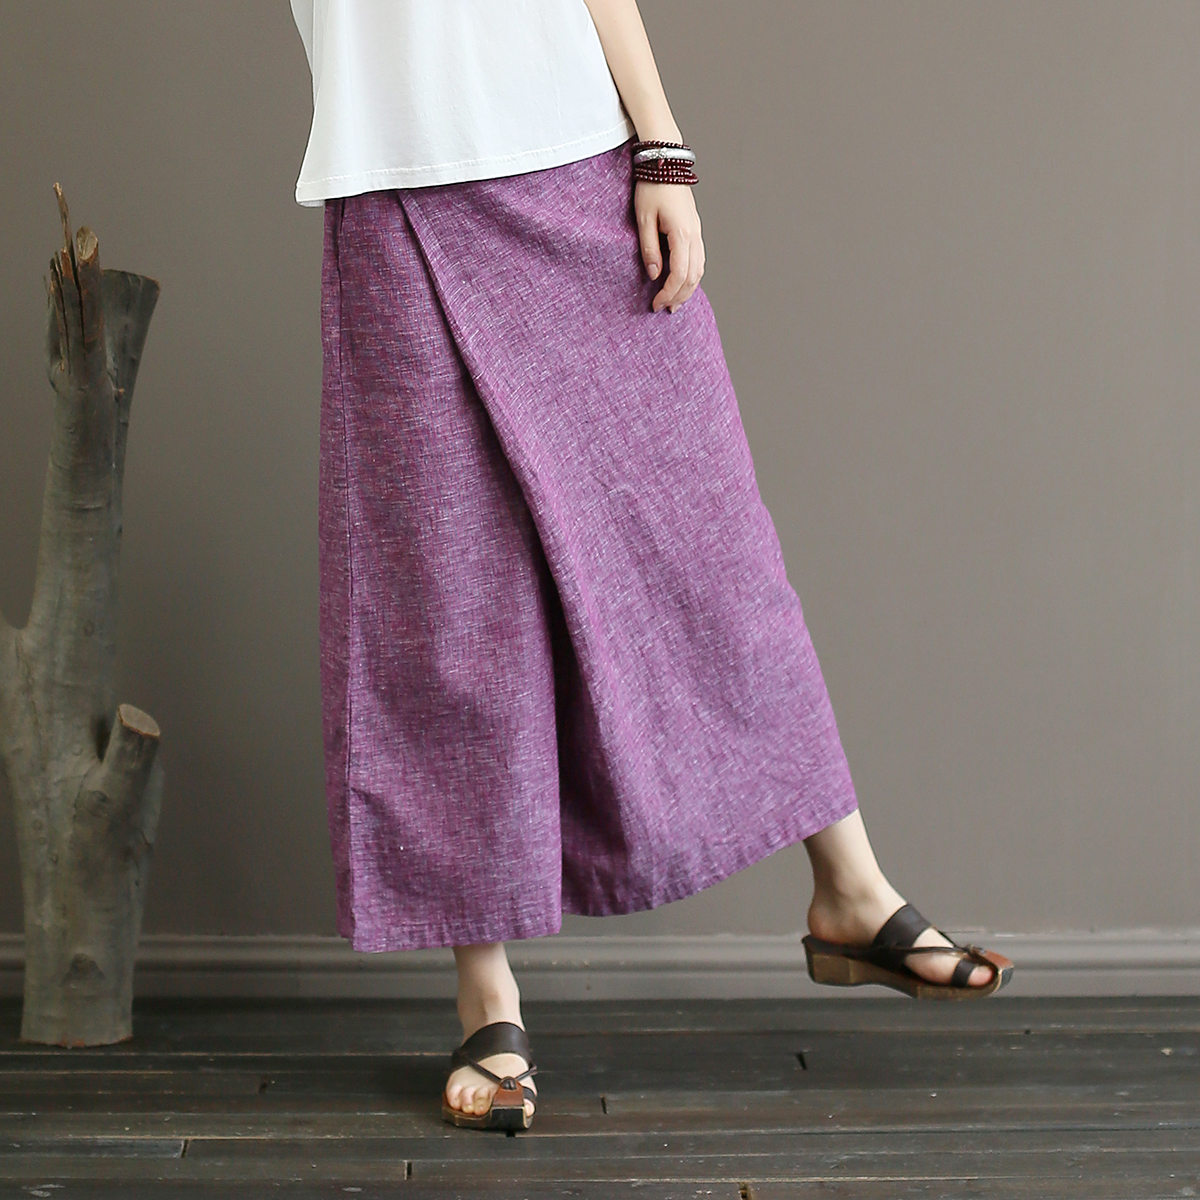 Johnature Solid Color Elastic Mid Waist New Skirt   Pants   2018 New Summer Vintage Loose Cotton Linen Ankle-Length   Wide     Leg     Pants